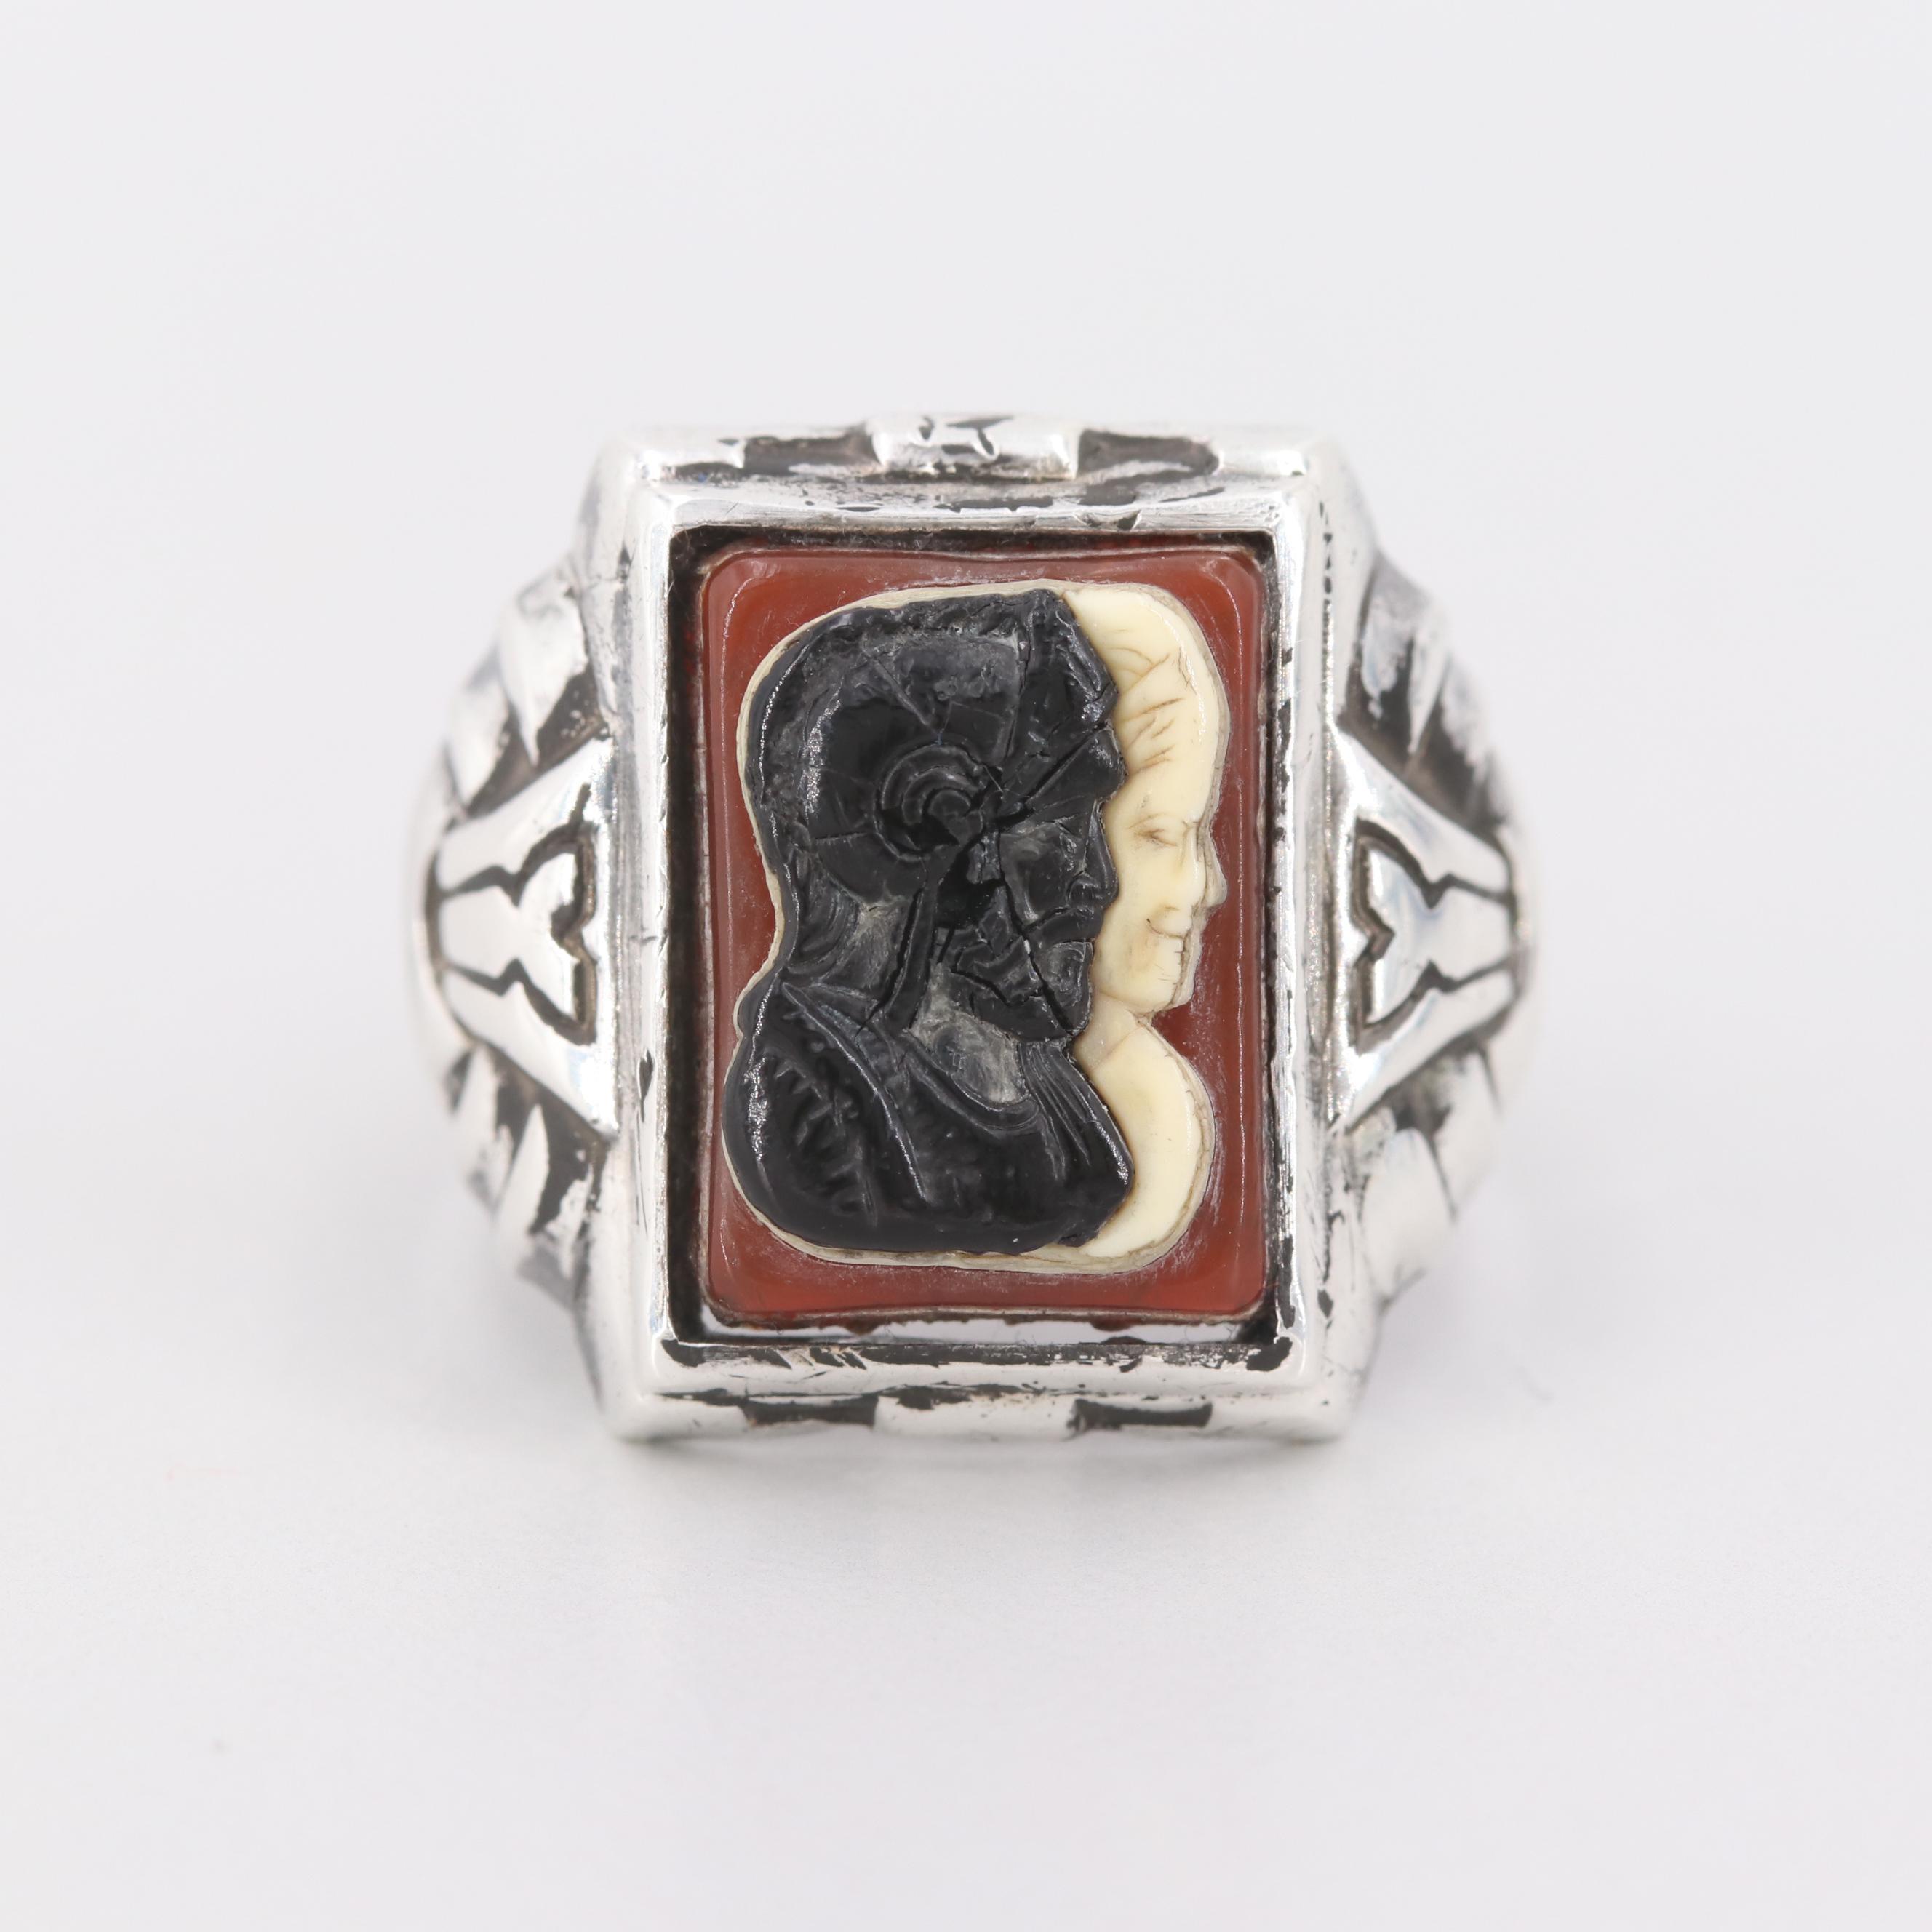 Vintage Uncas Sterling Silver Imitation Sardonyx Double Warrior Cameo Ring